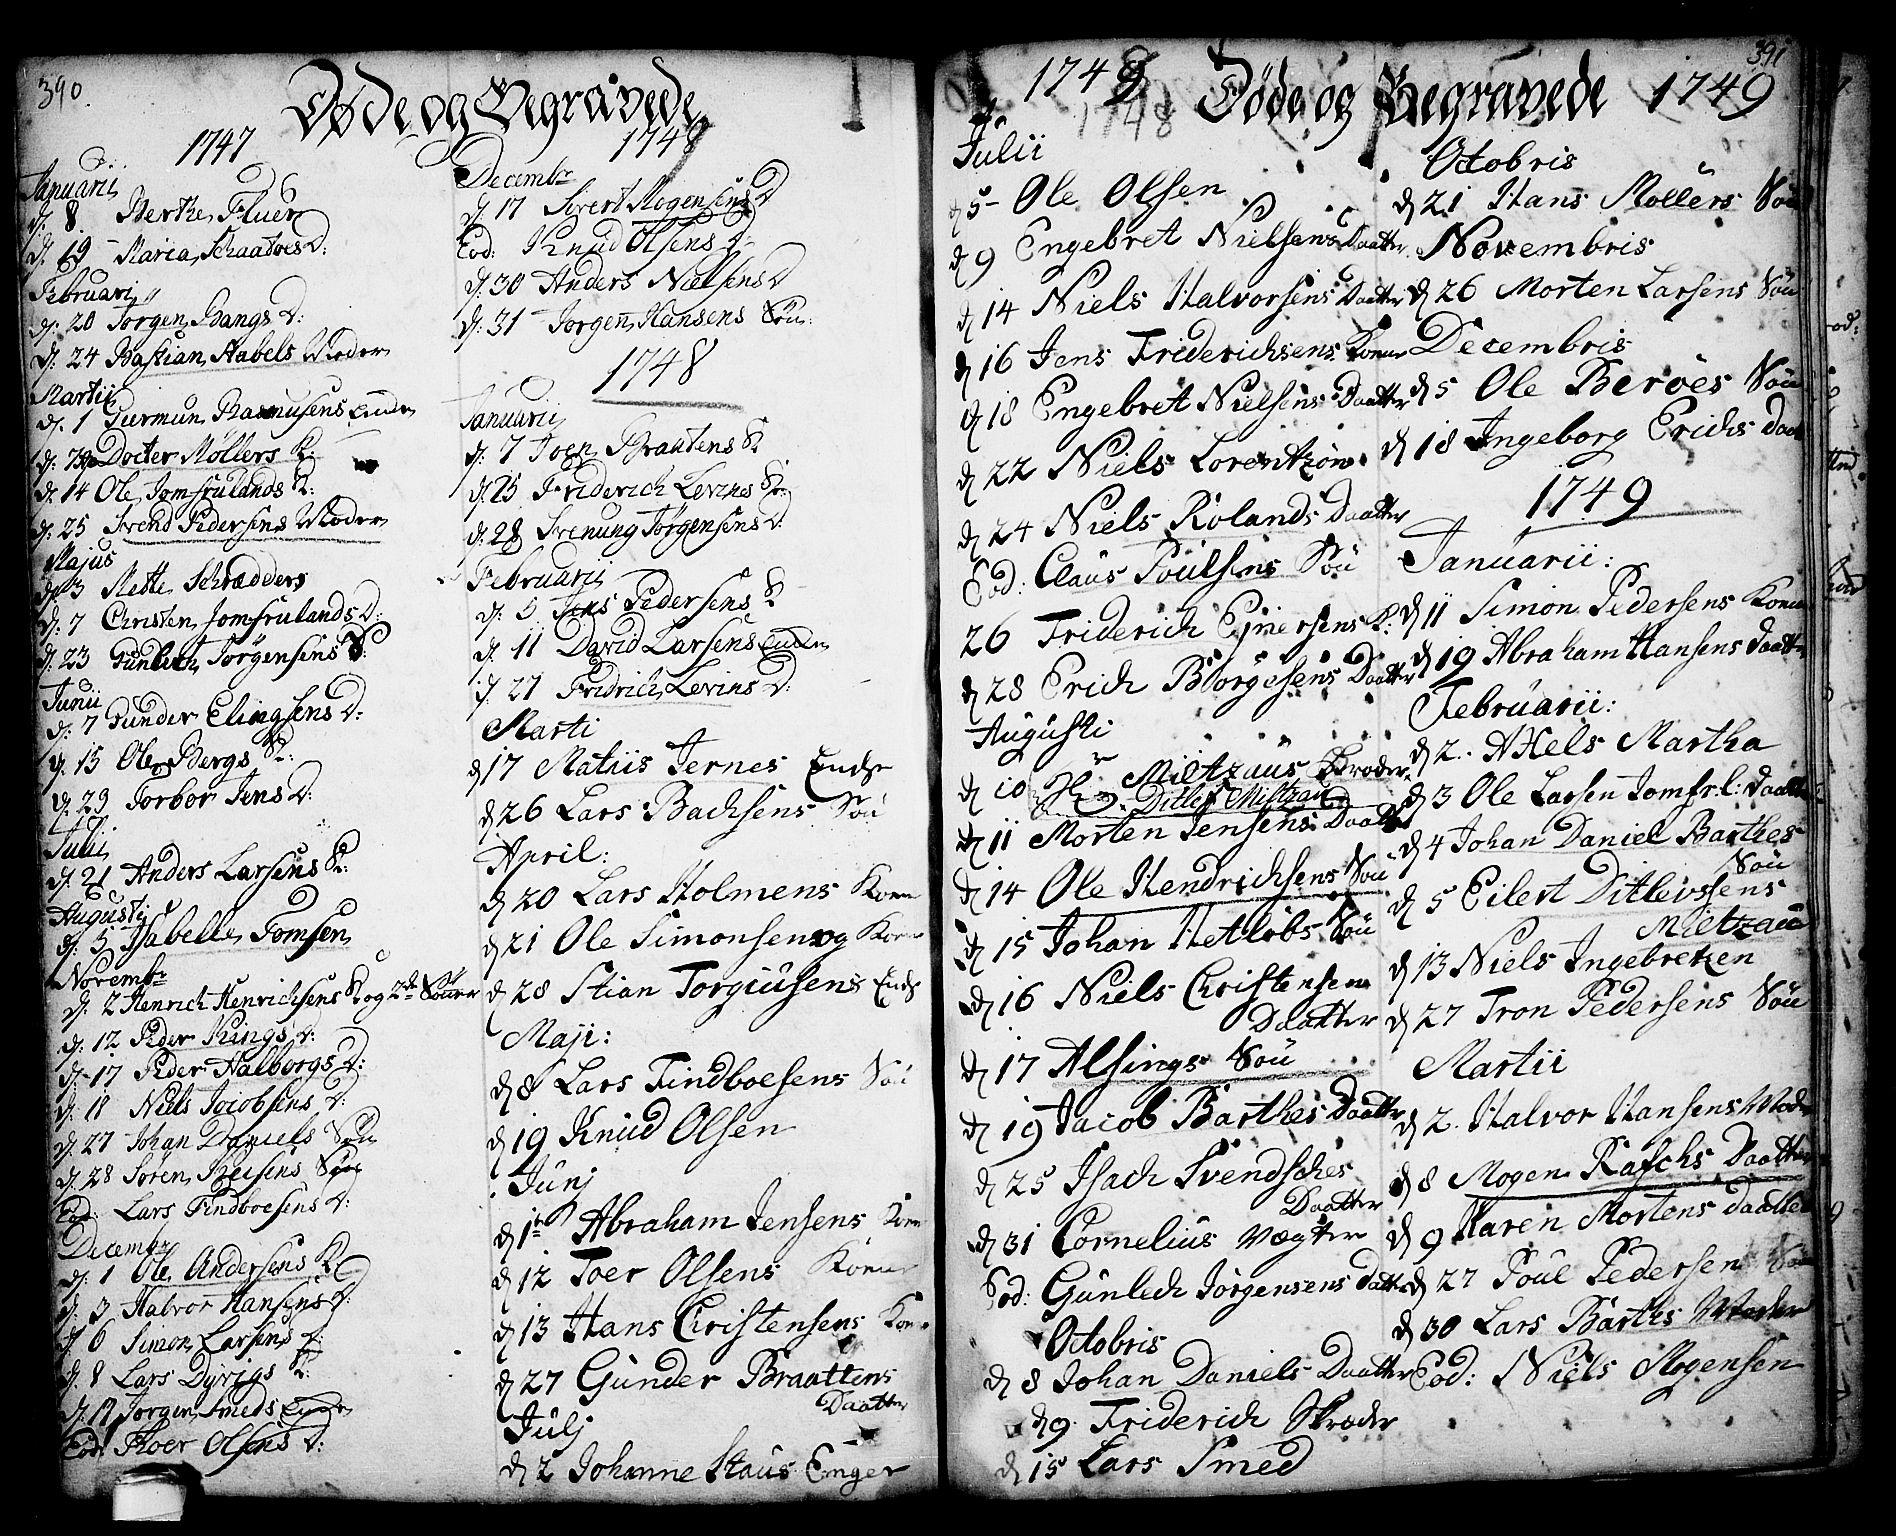 SAKO, Kragerø kirkebøker, F/Fa/L0001: Ministerialbok nr. 1, 1702-1766, s. 390-391